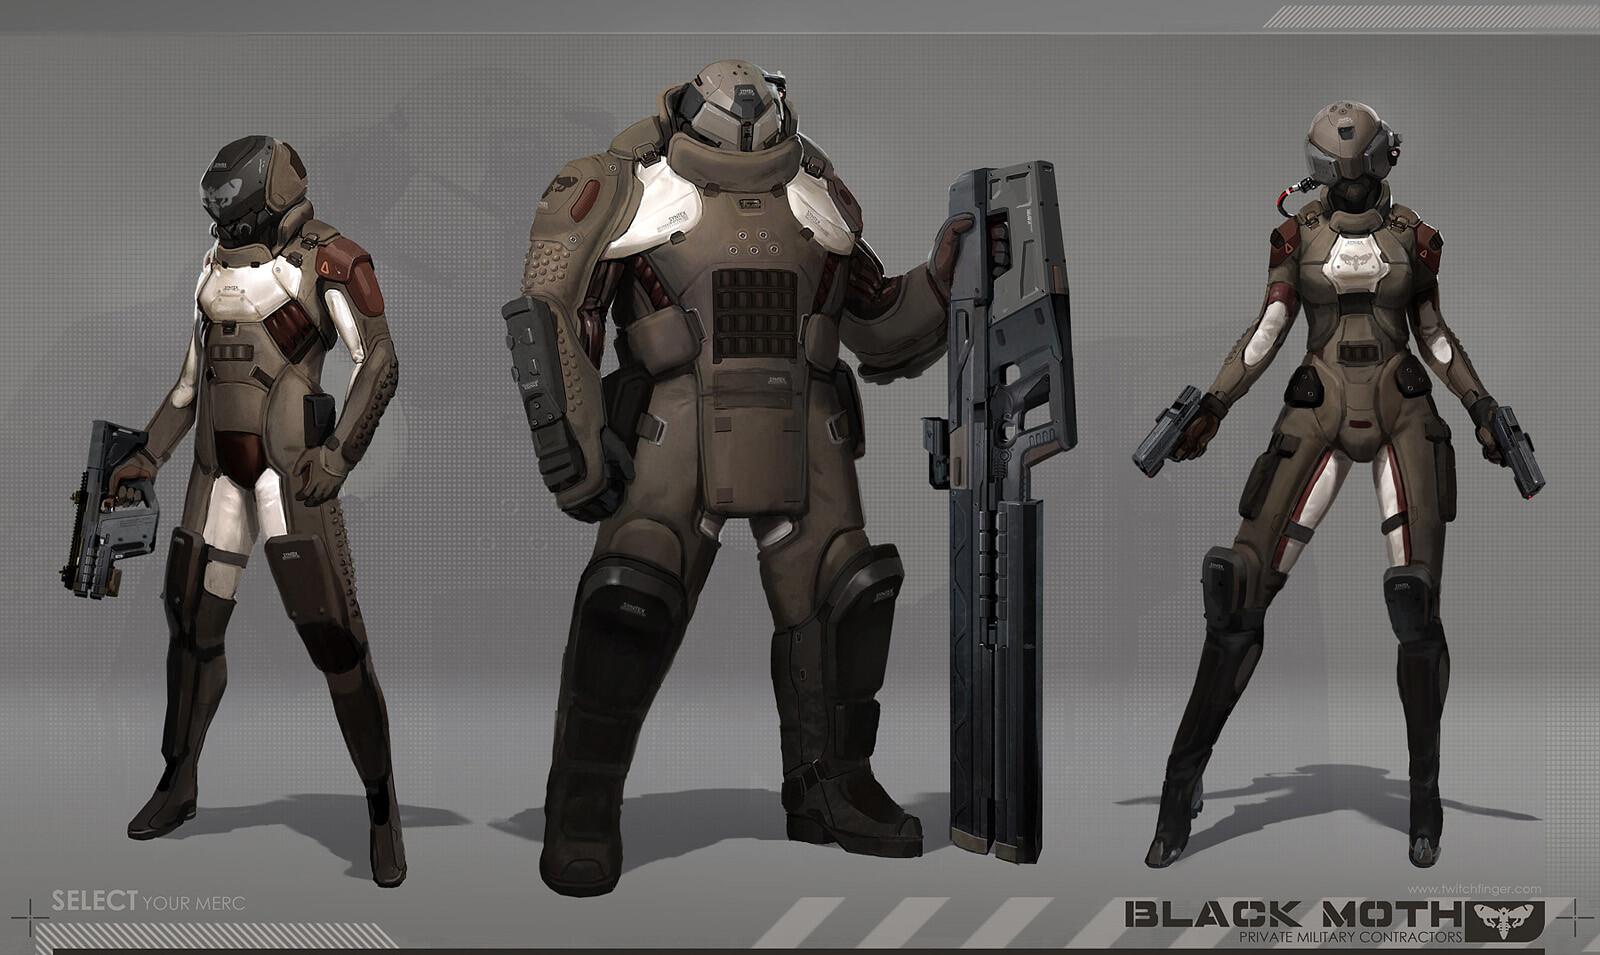 Adrian Majkrzak  Black Moth Concept